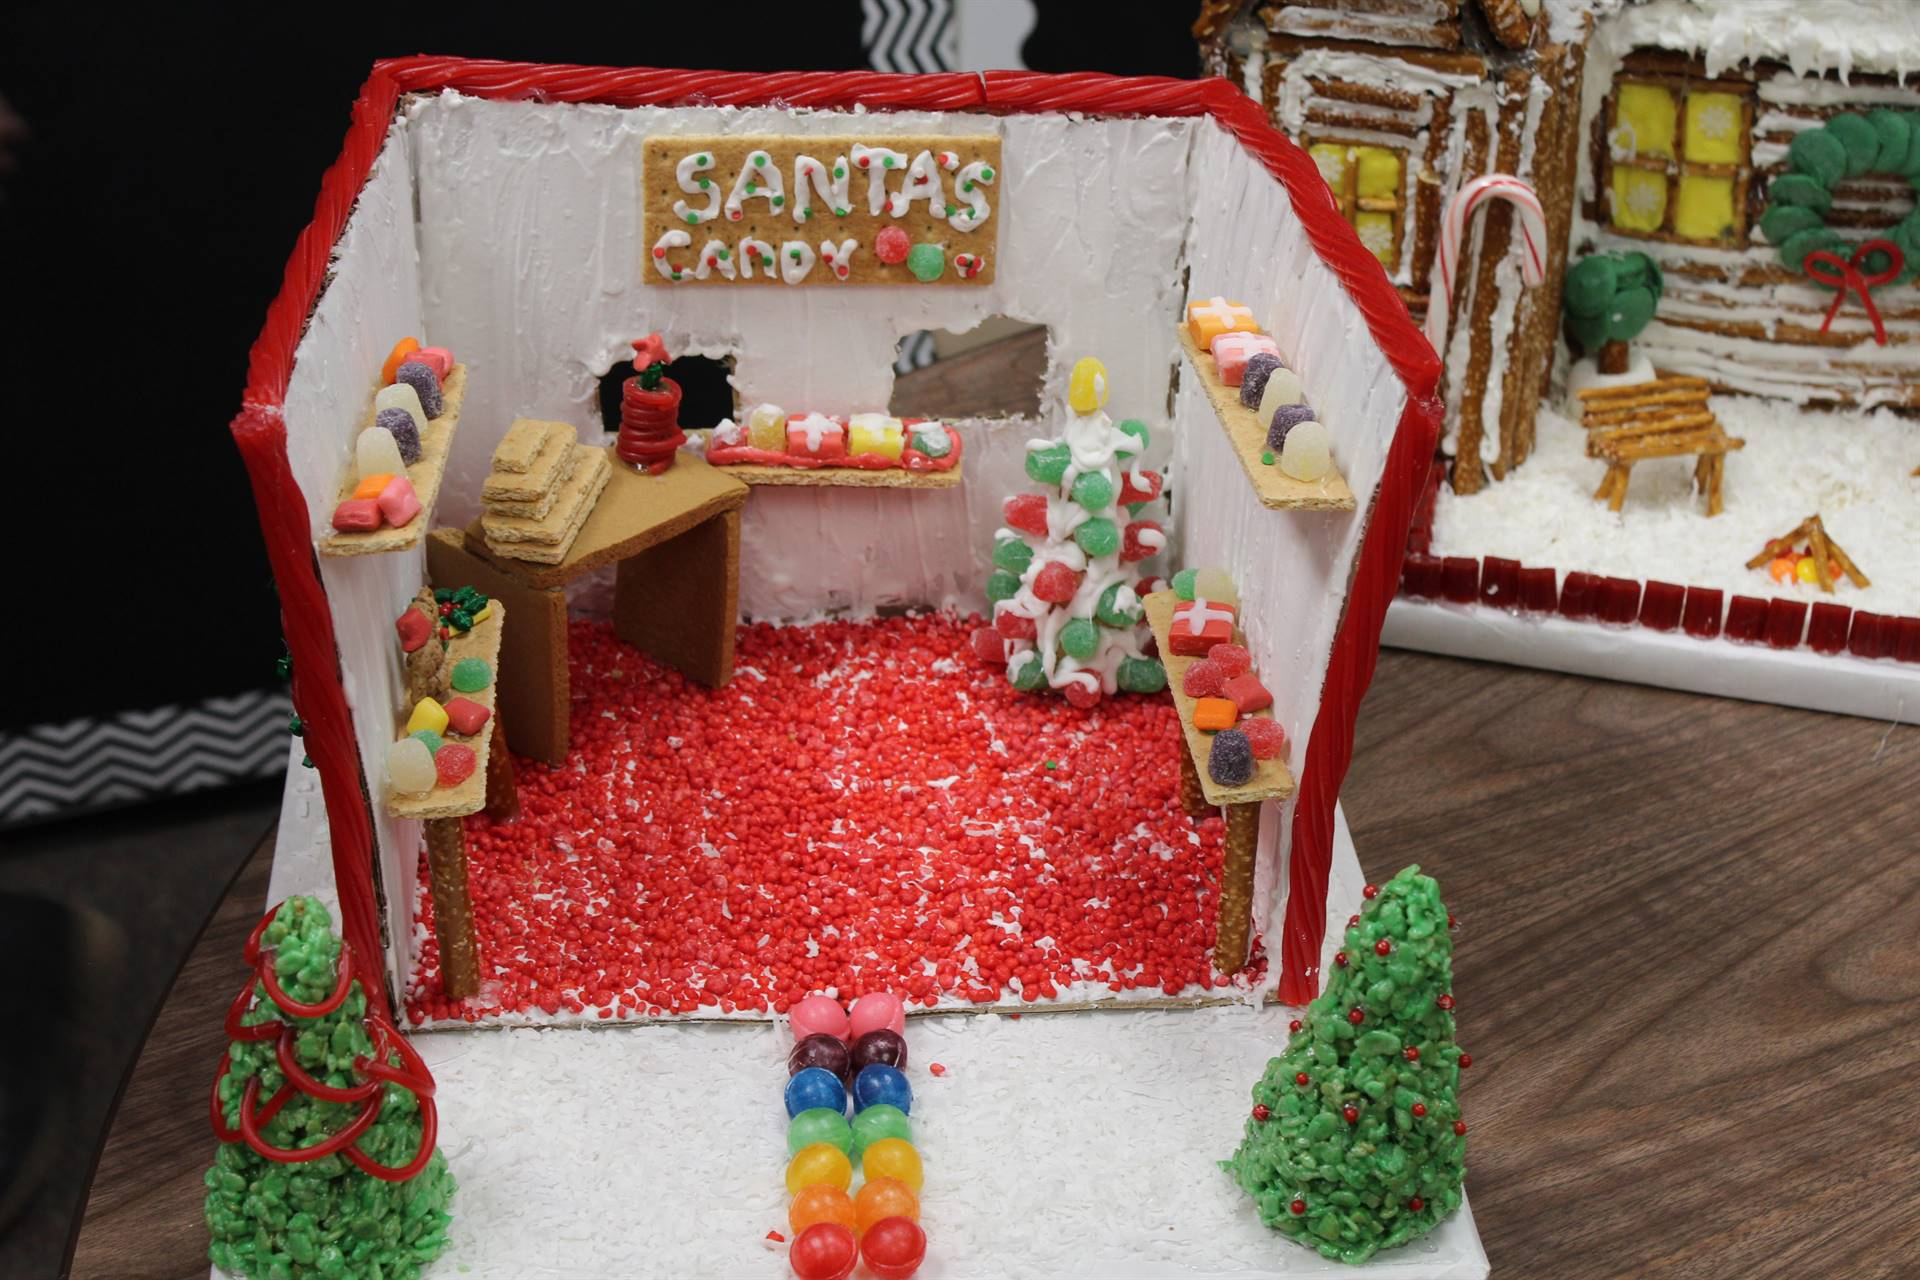 Santa's candy shop